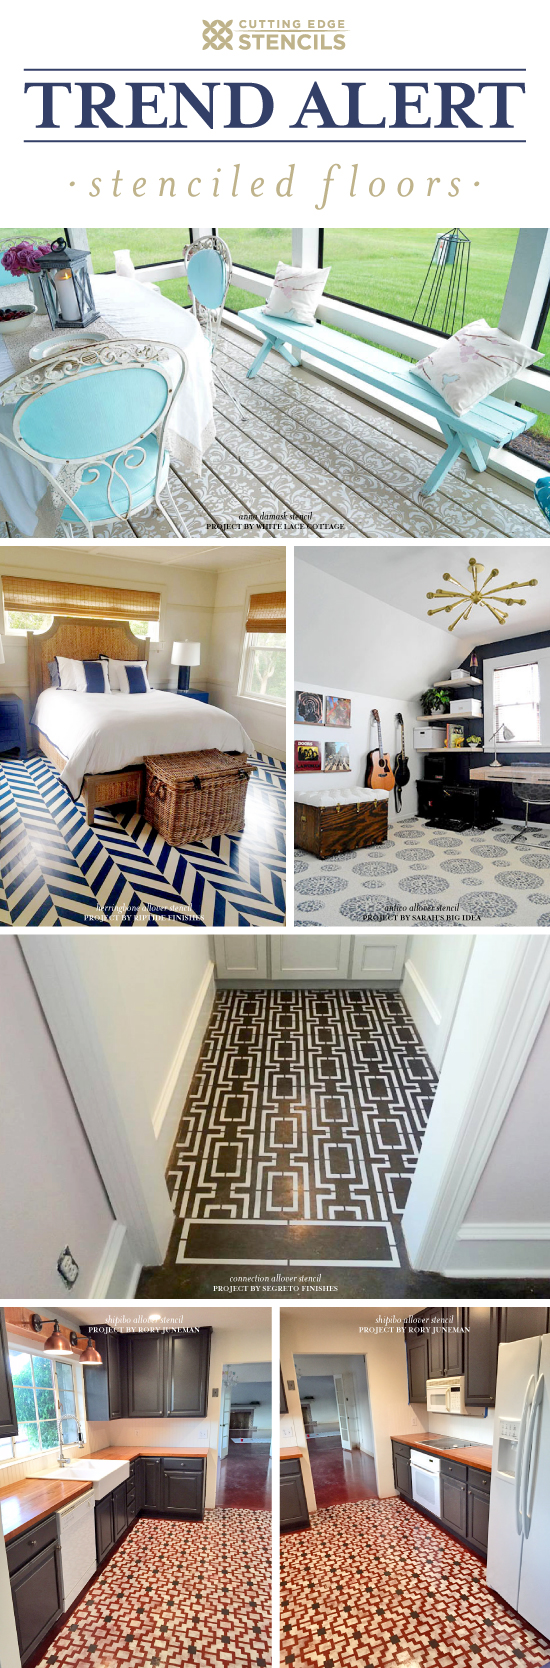 Cutting Edge Stencils shares DIY painted and stenciled floor ideas. http://www.cuttingedgestencils.com/wall-stencils-stencil-designs.html